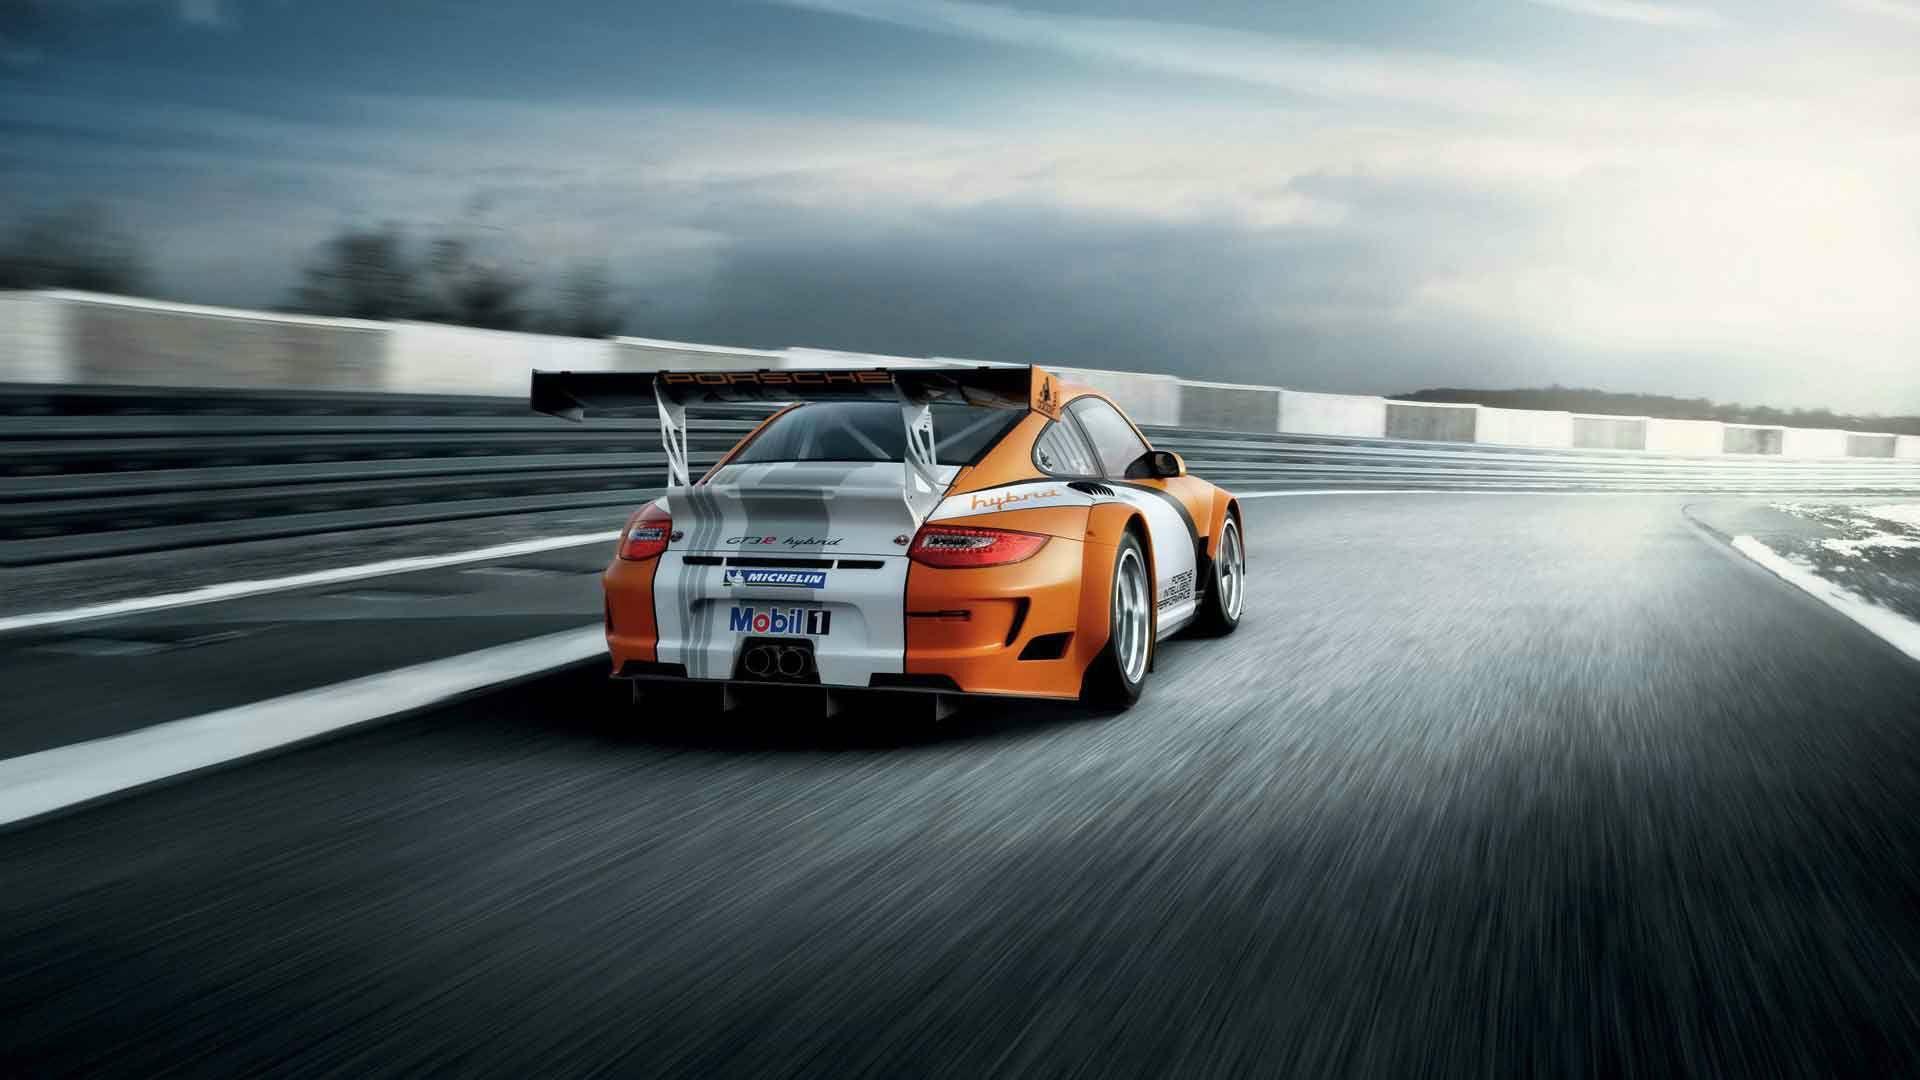 Racing Car Hd Wallpapers Top Free Racing Car Hd